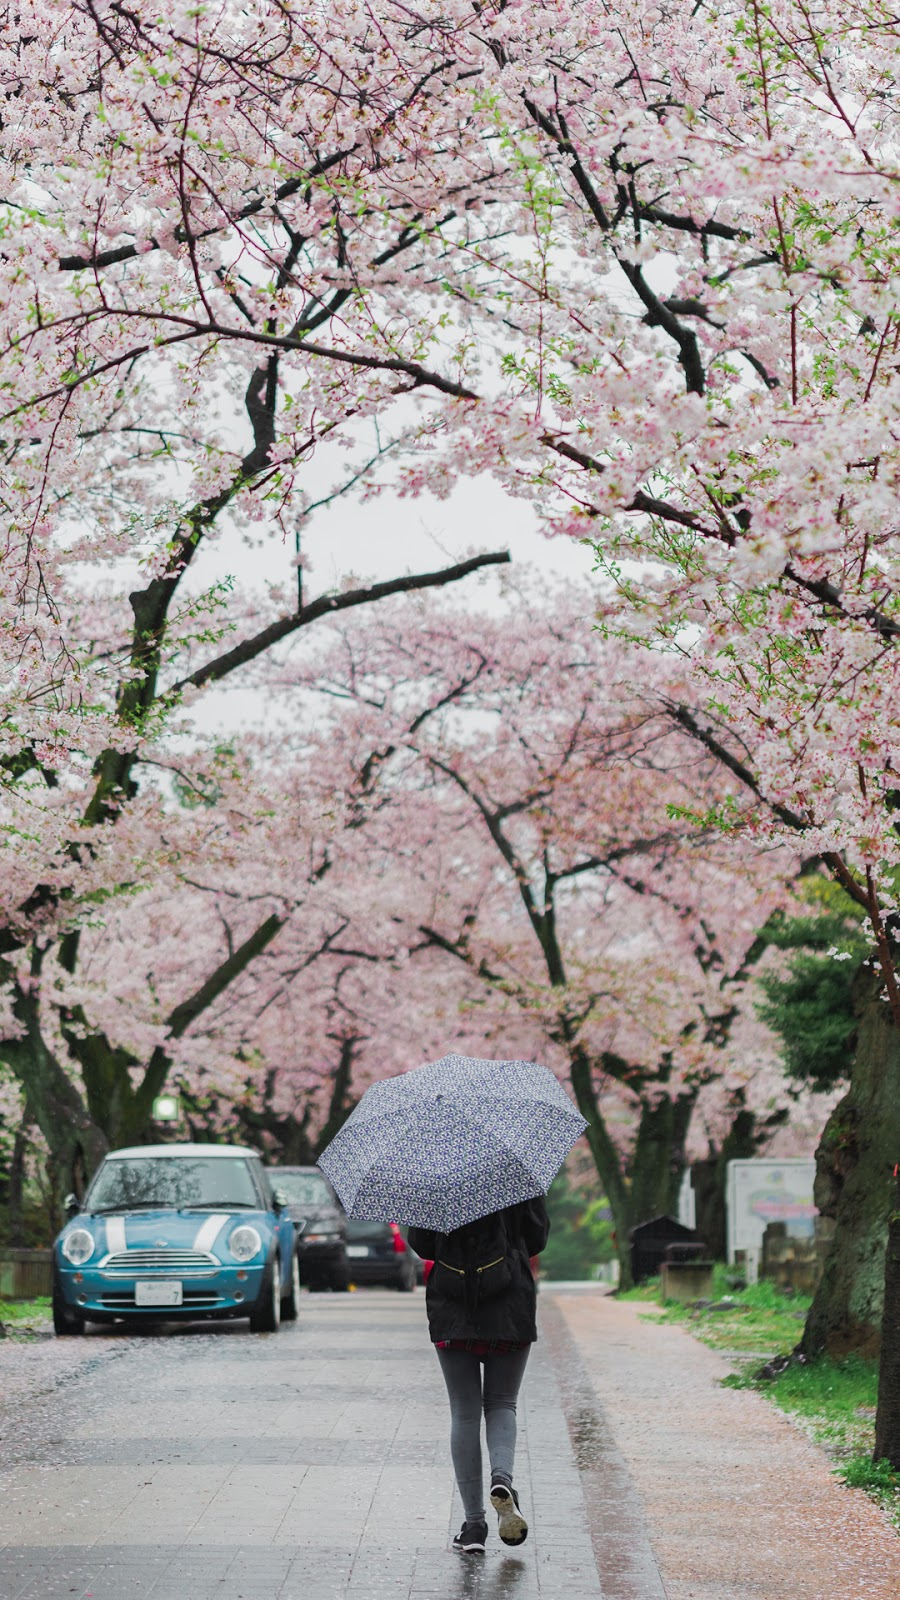 Cherry Blossom Wallpaper In Japan